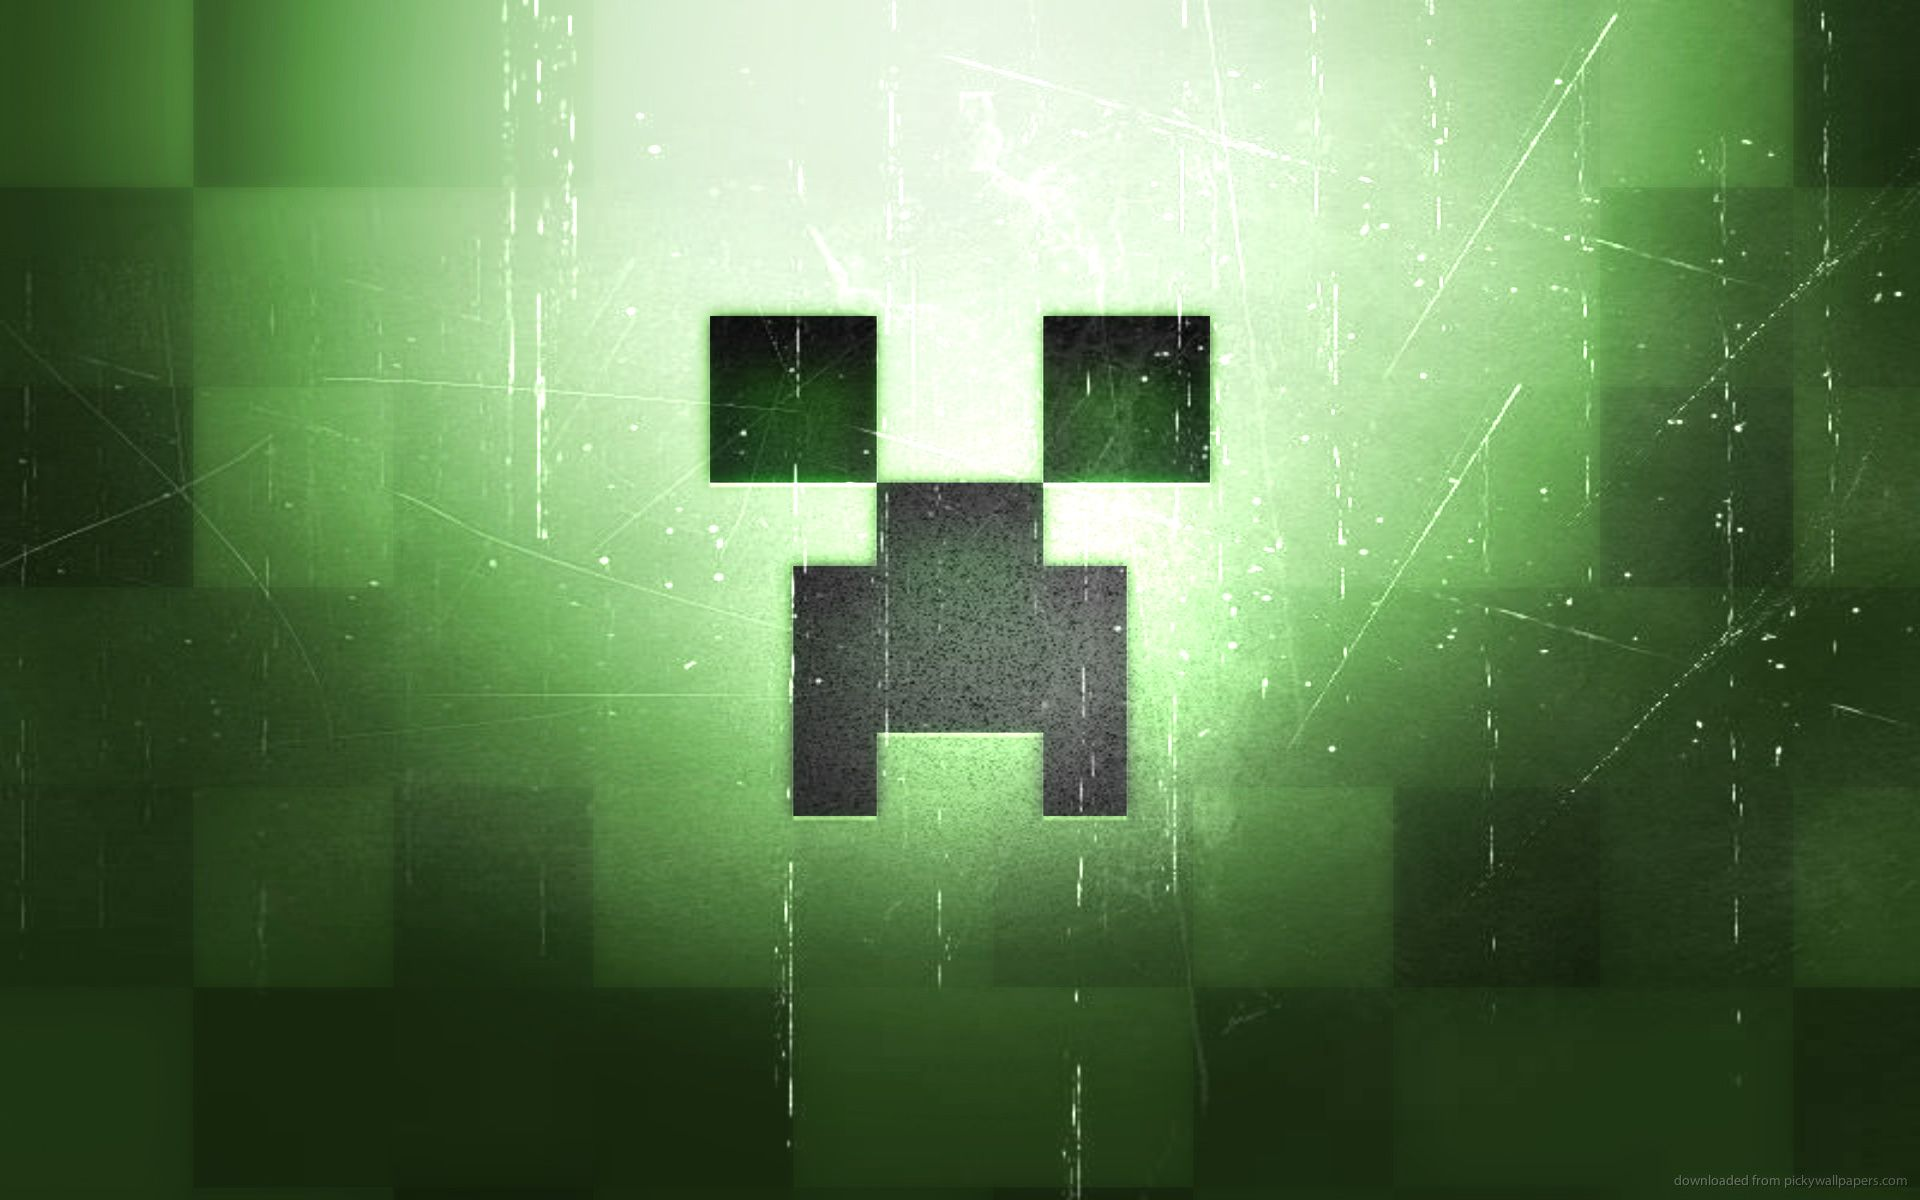 Cool Wallpaper Minecraft Green - 5e9e07e67489bd19d3559ad8043dbff3  Image_518293.jpg